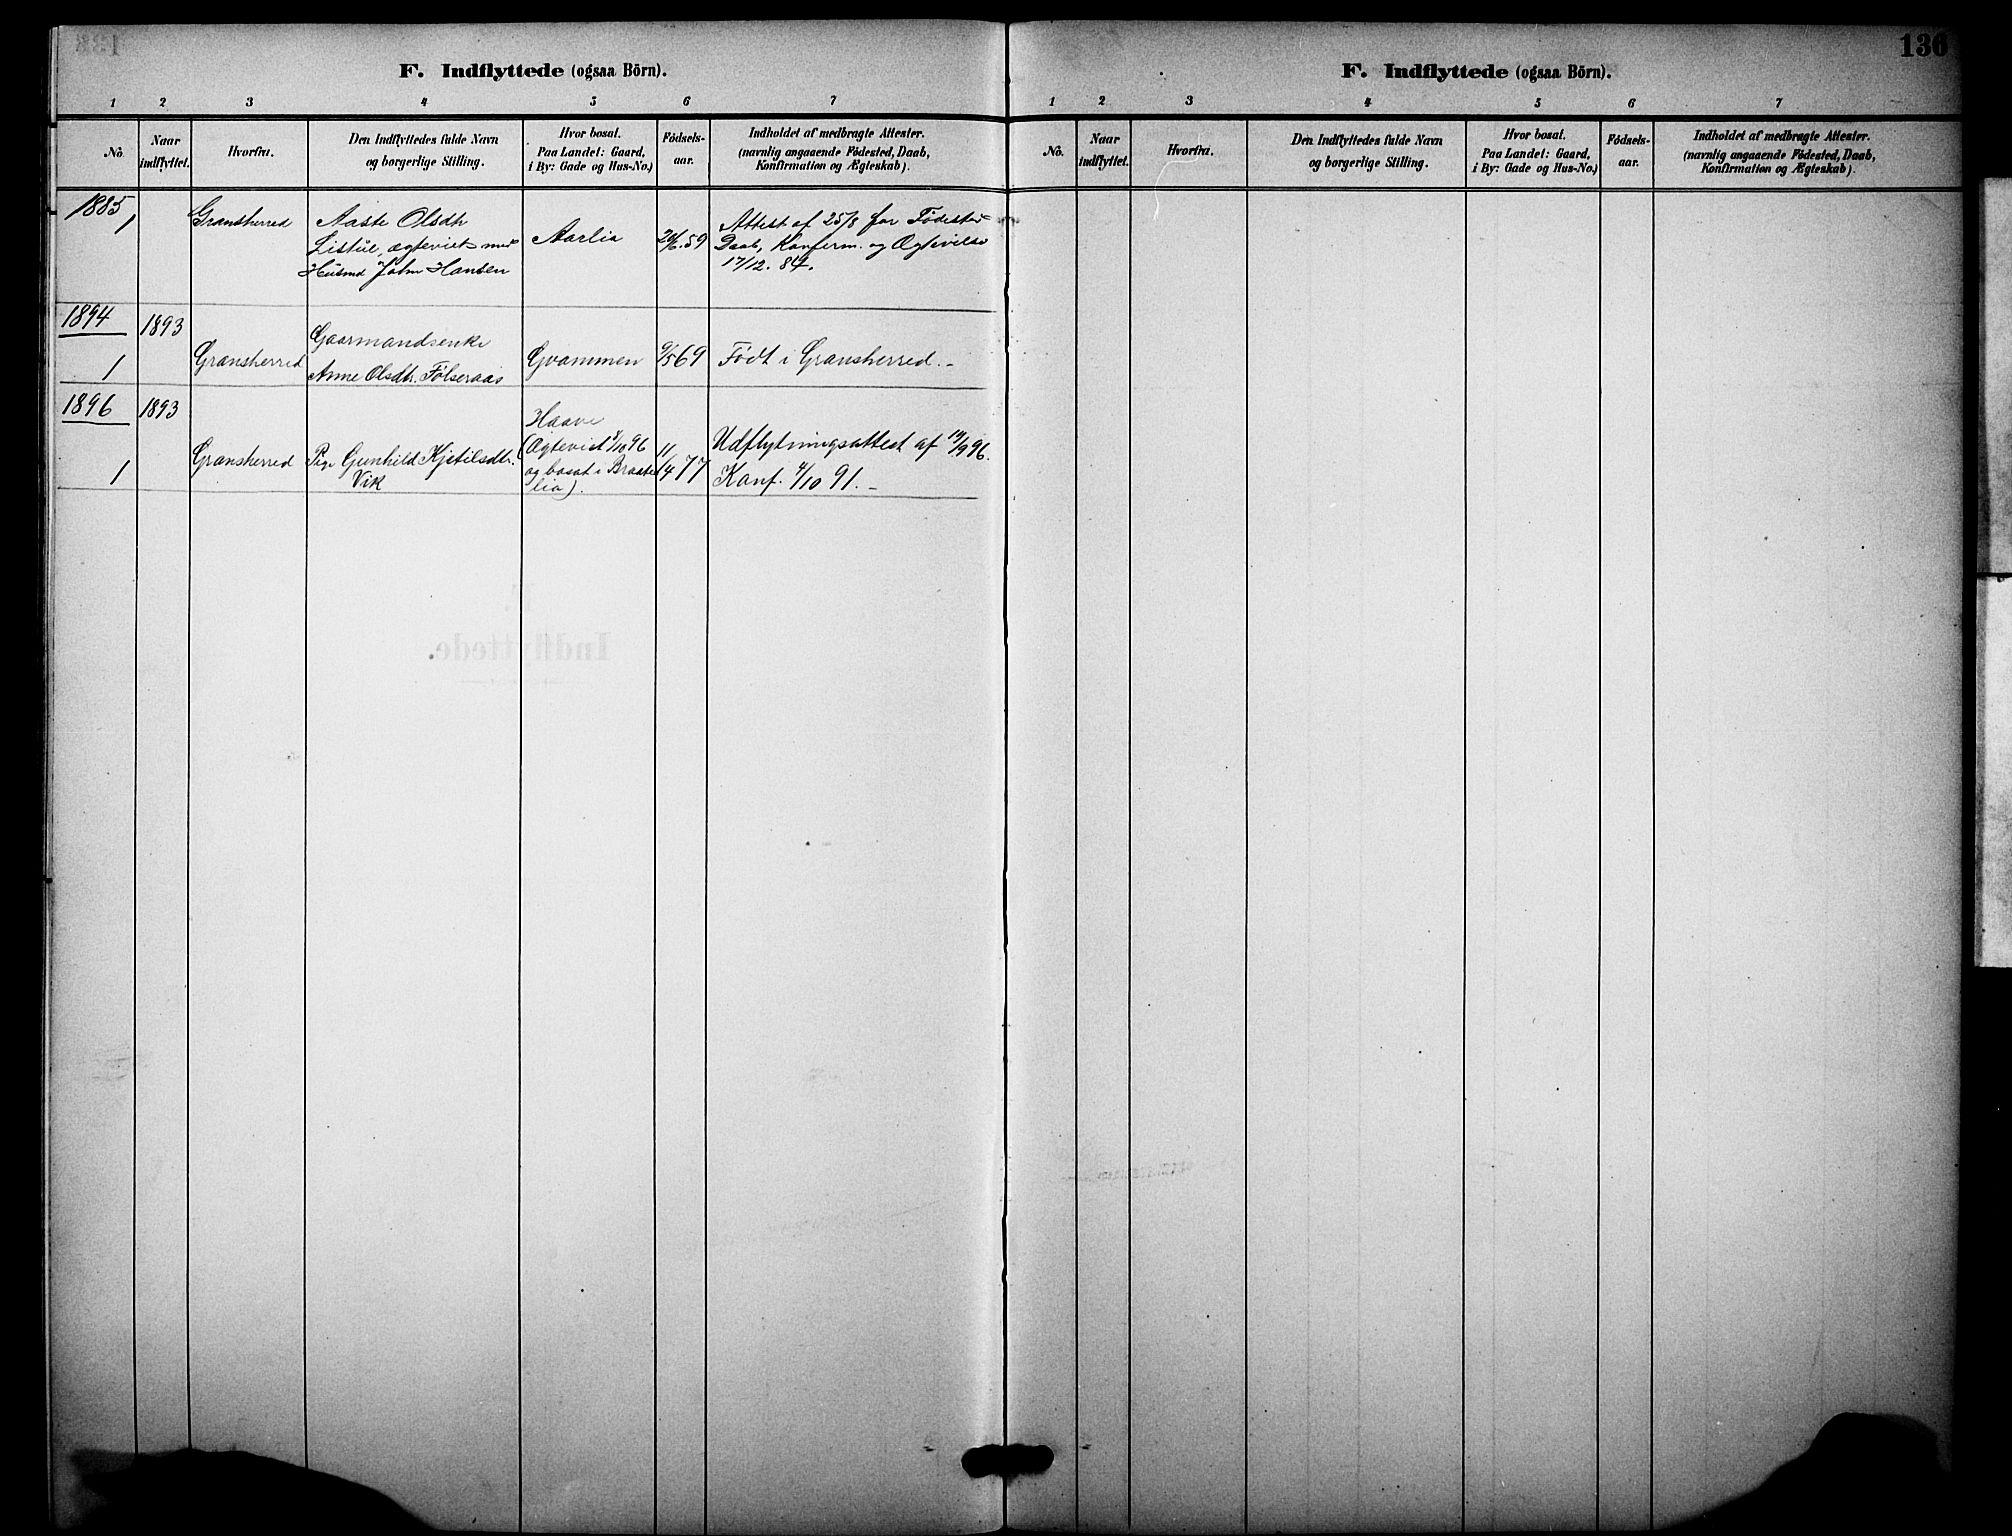 SAKO, Heddal kirkebøker, F/Fb/L0001: Ministerialbok nr. II 1, 1884-1910, s. 136